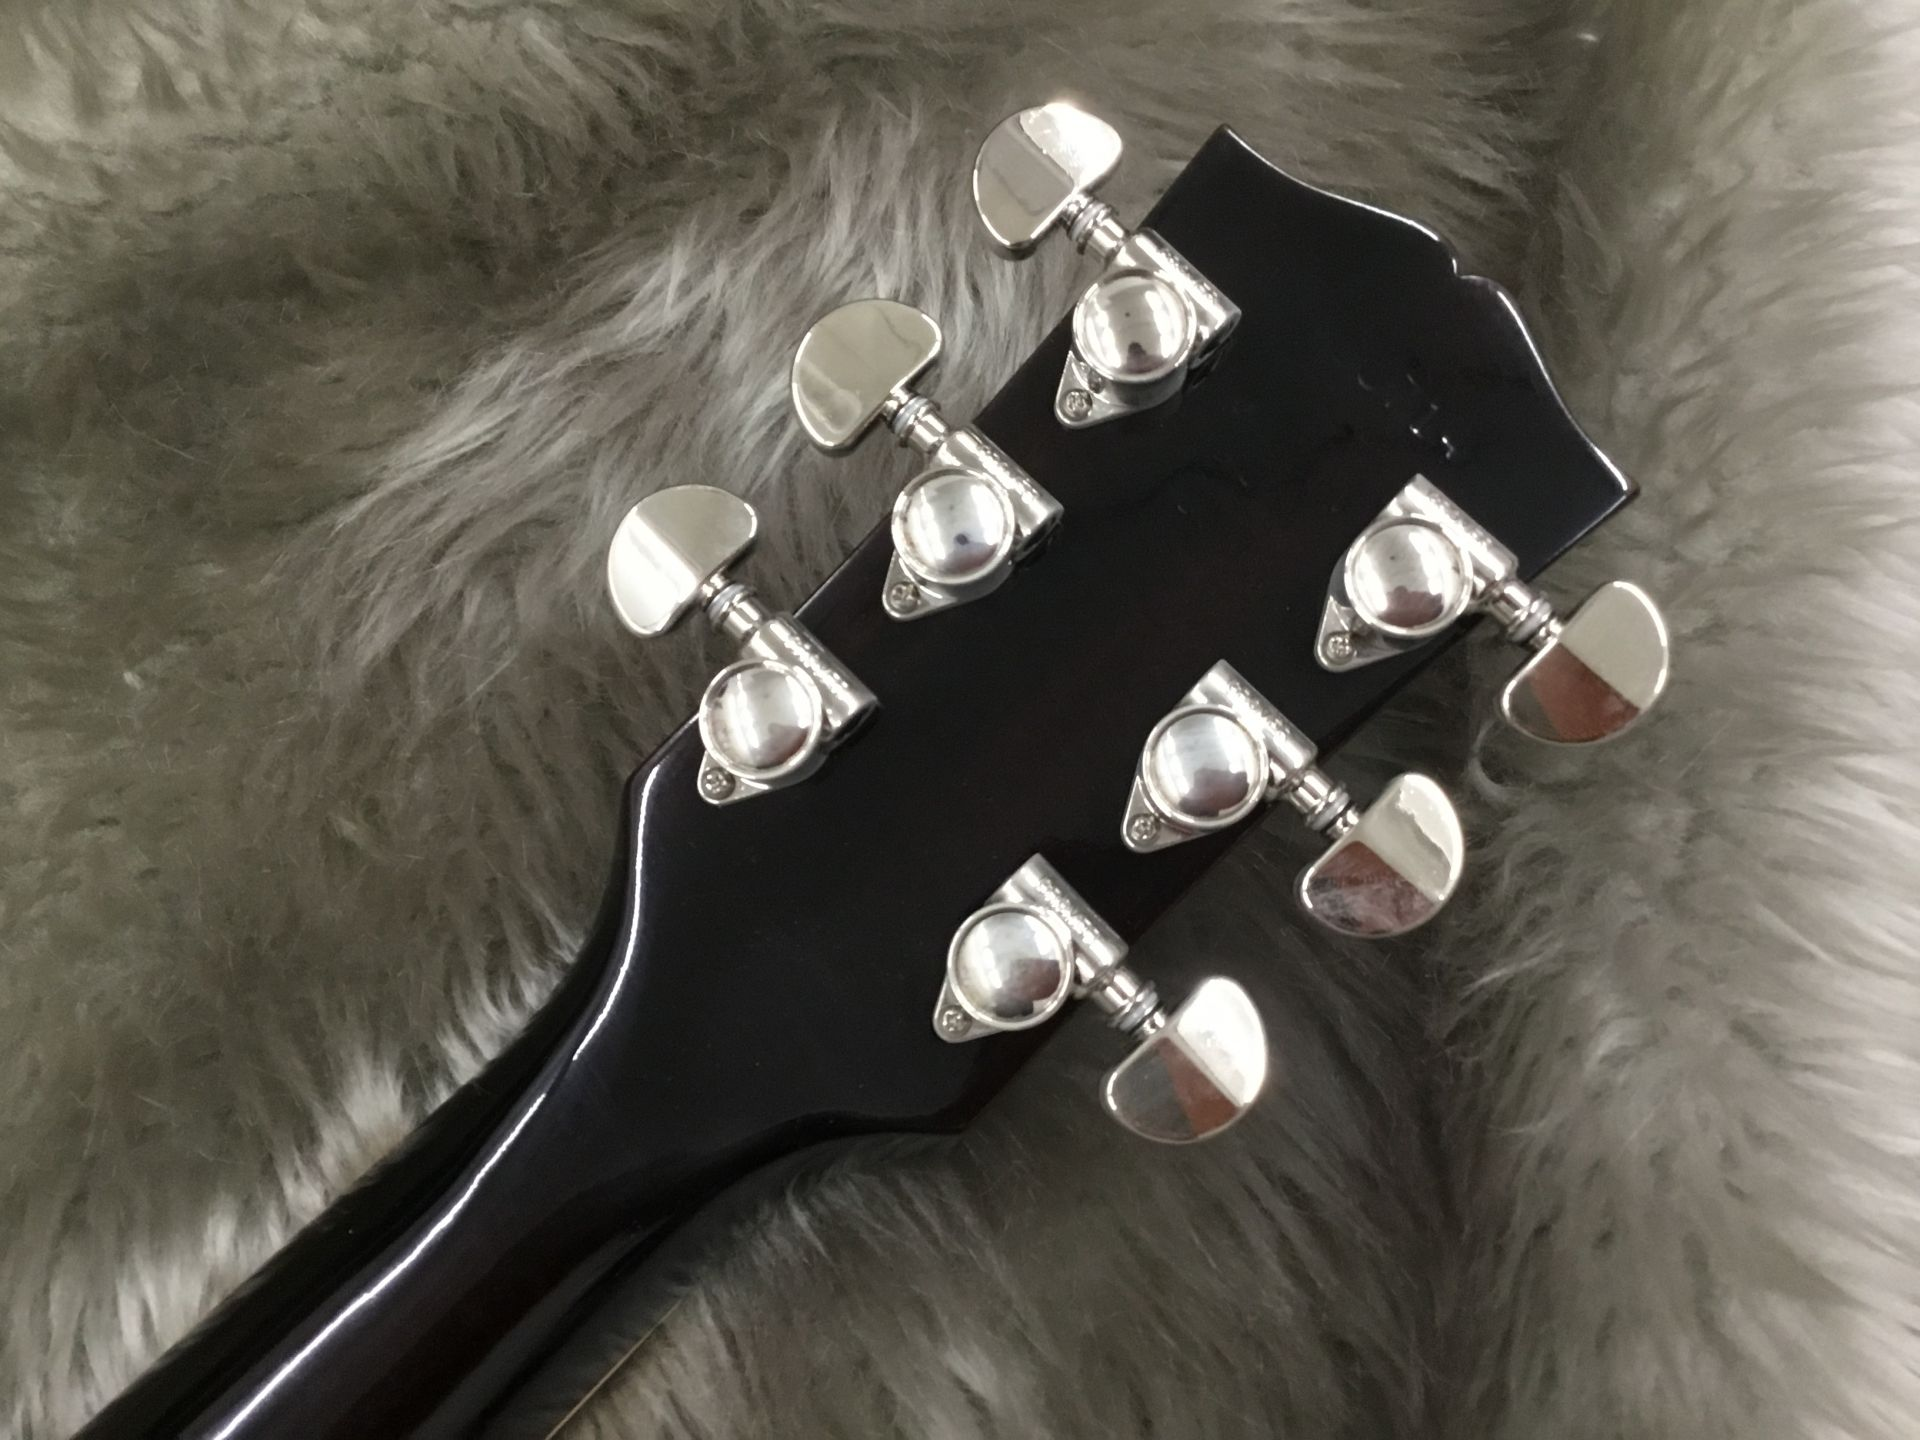 ES-335のヘッド裏-アップ画像